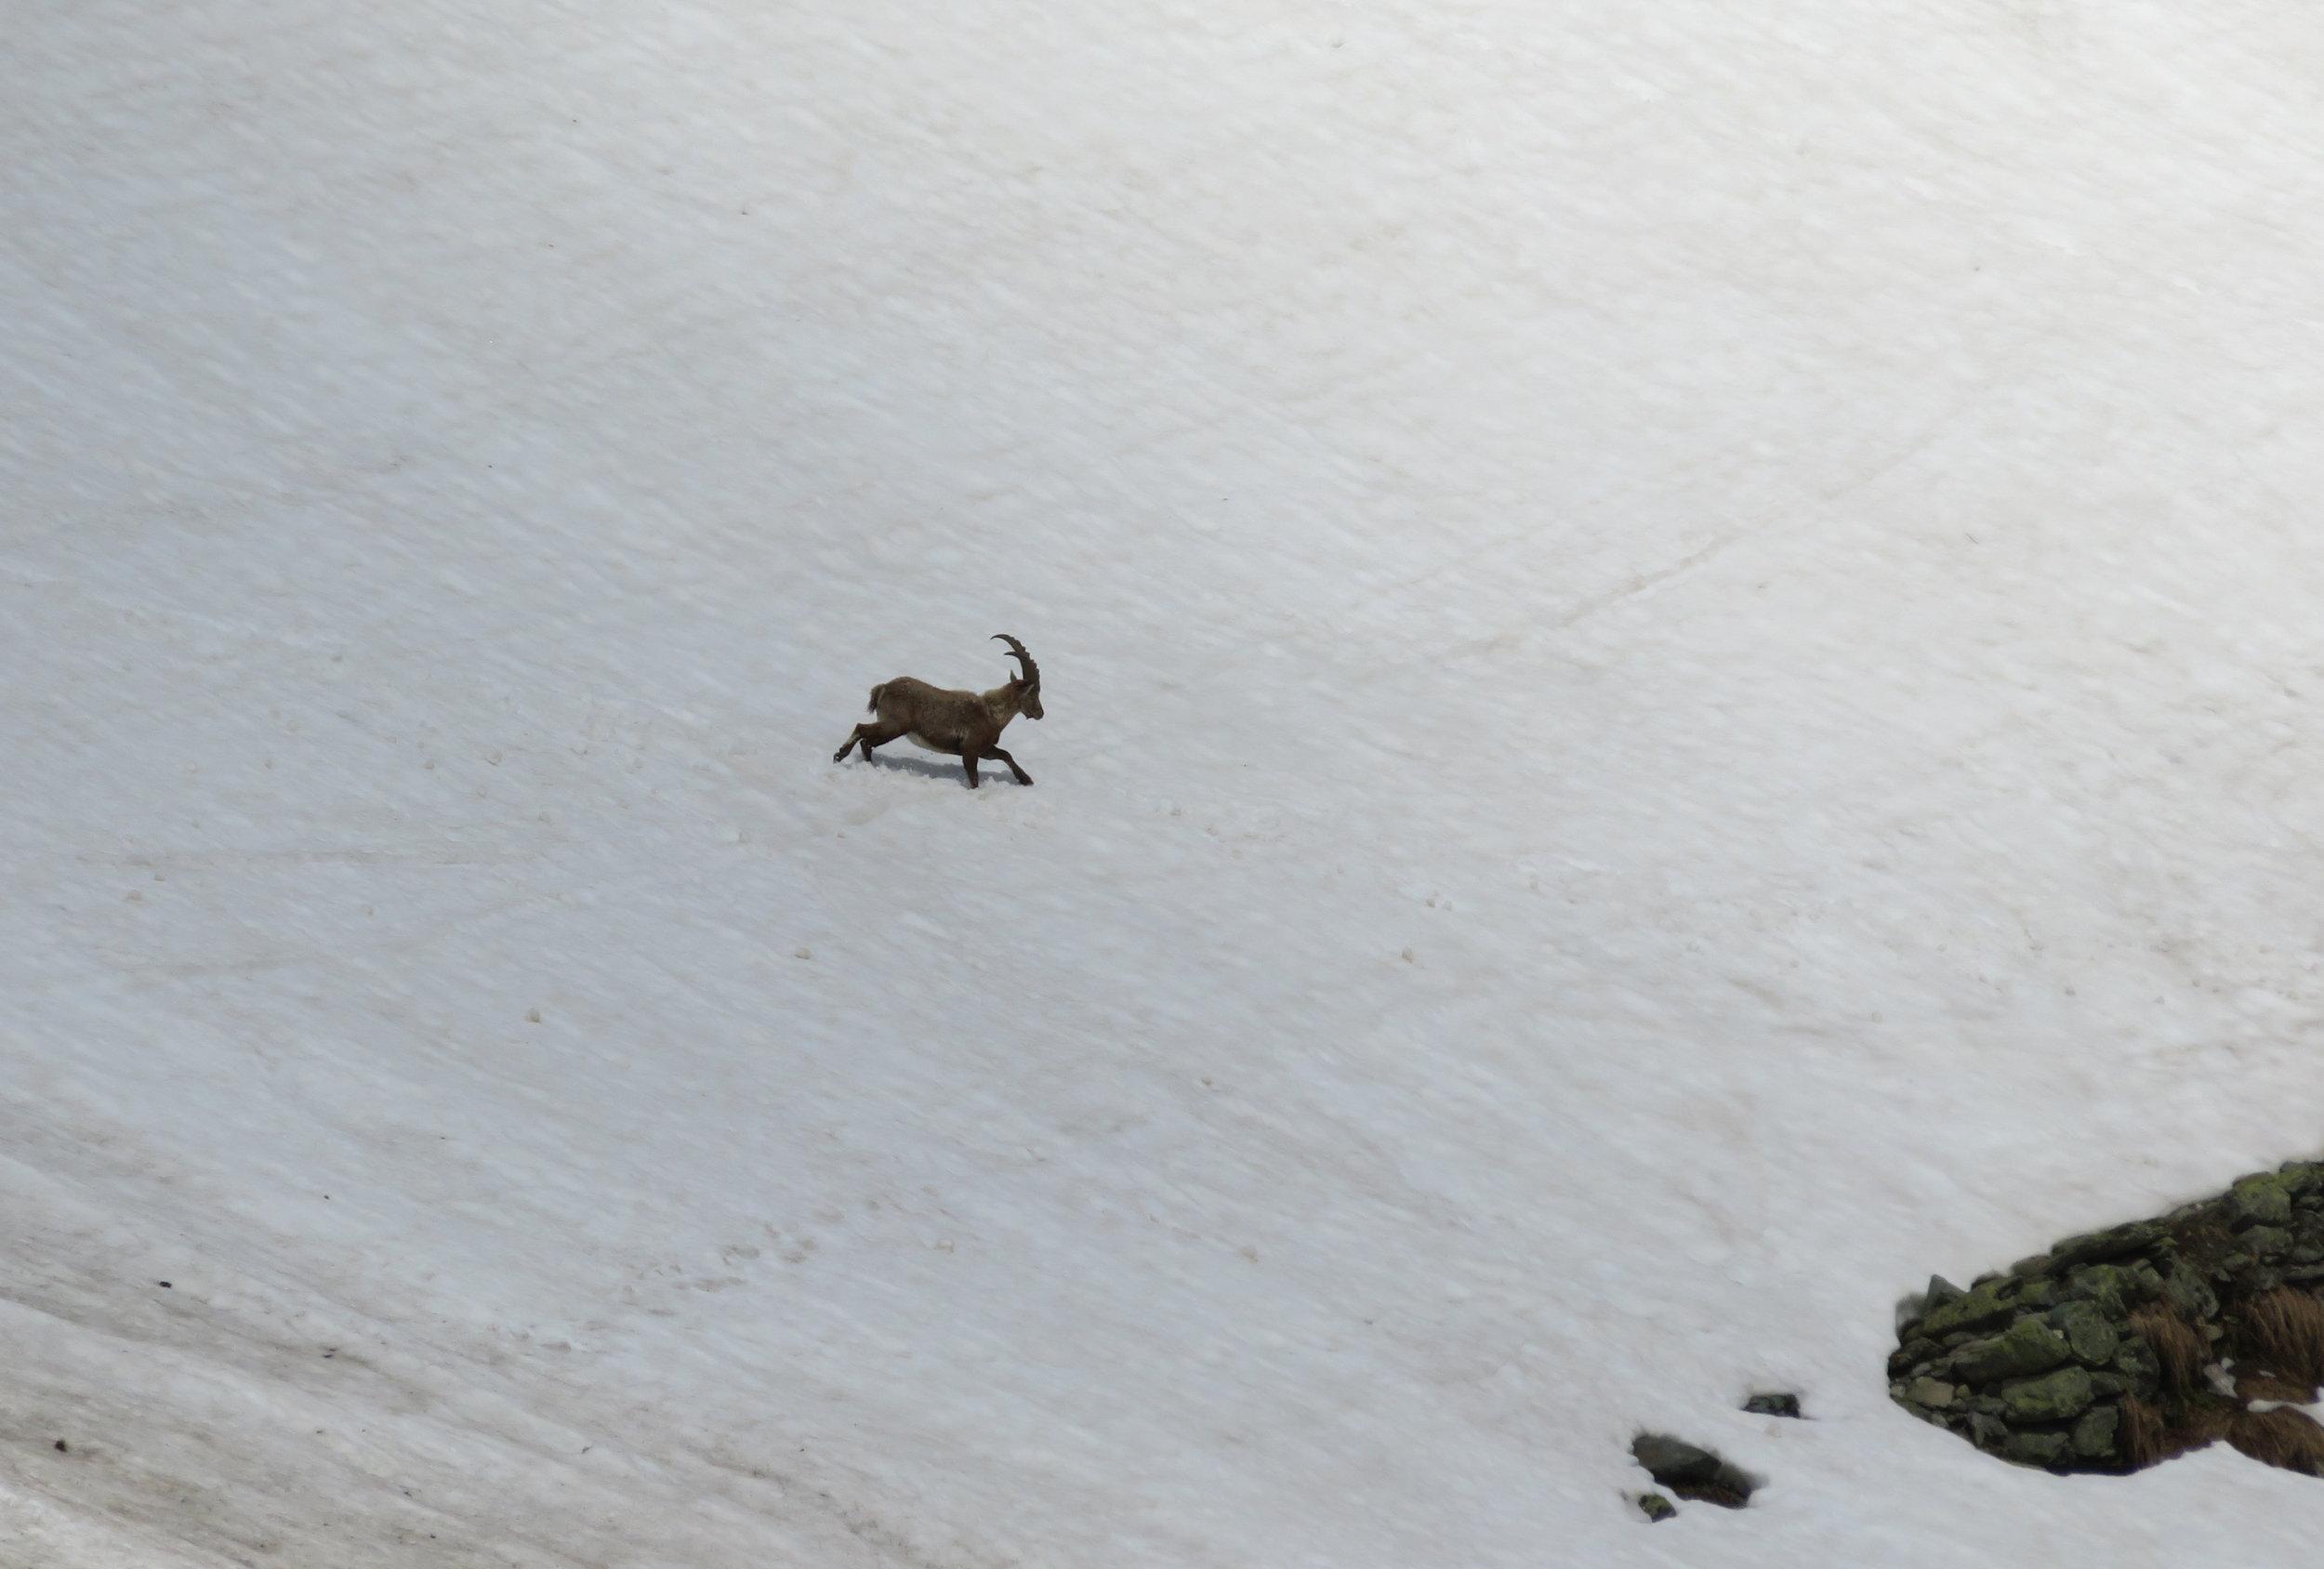 Ibex crossing the snow